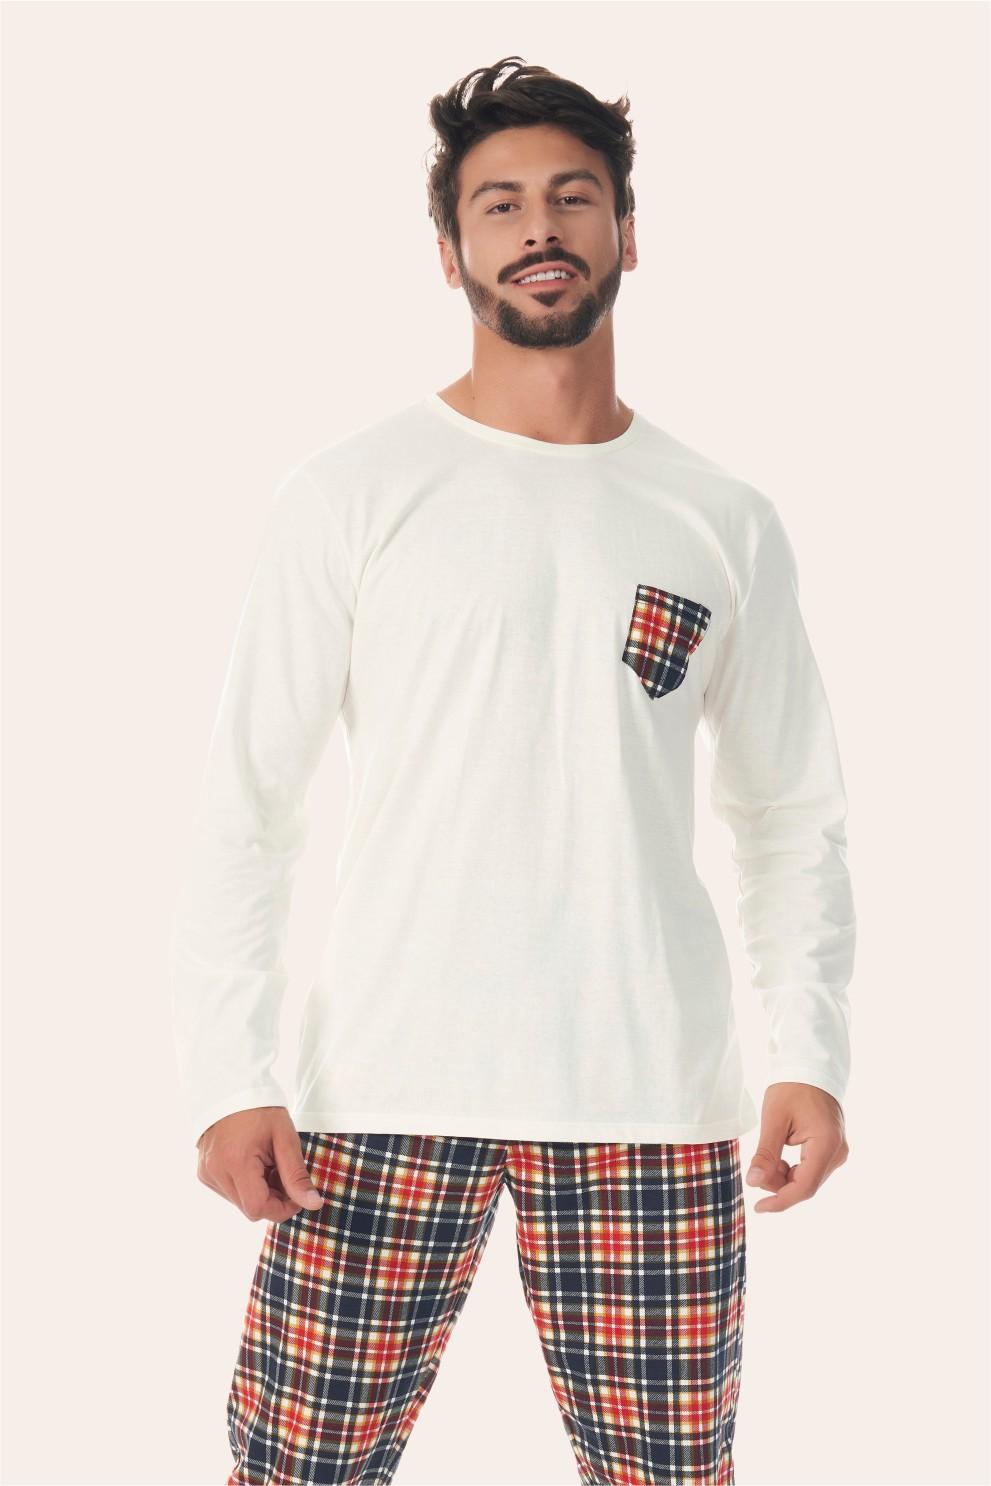 002/L - Pijama Adulto Masculino Happy Family